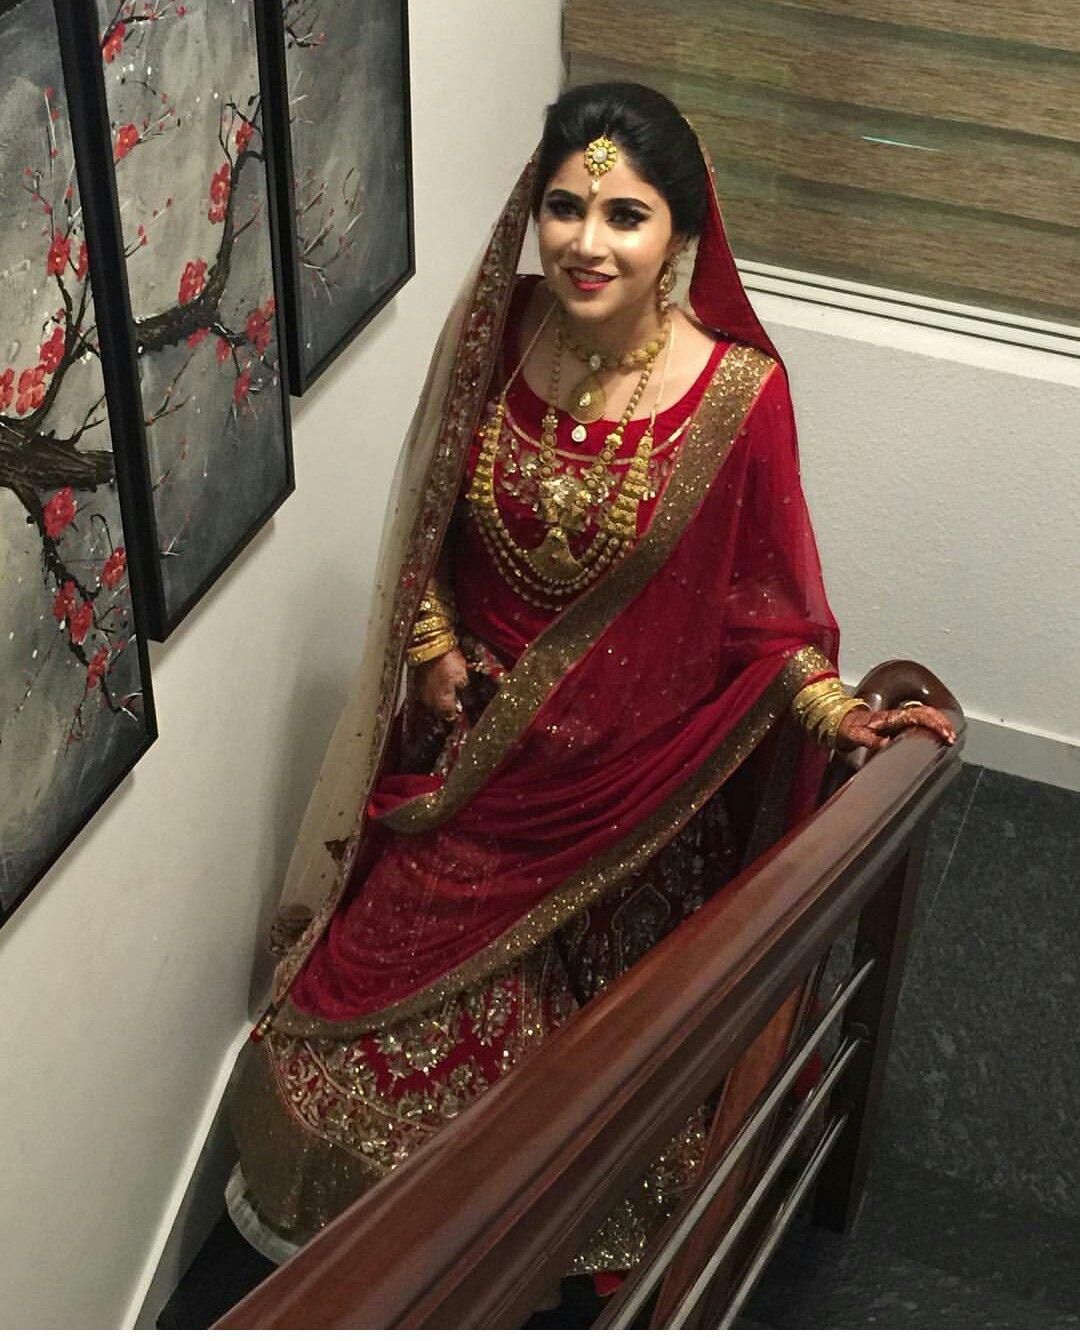 Kerala Marriage Bride Hair: Beautiful Muslim Bride # Kerala Wedding# Indian Antique